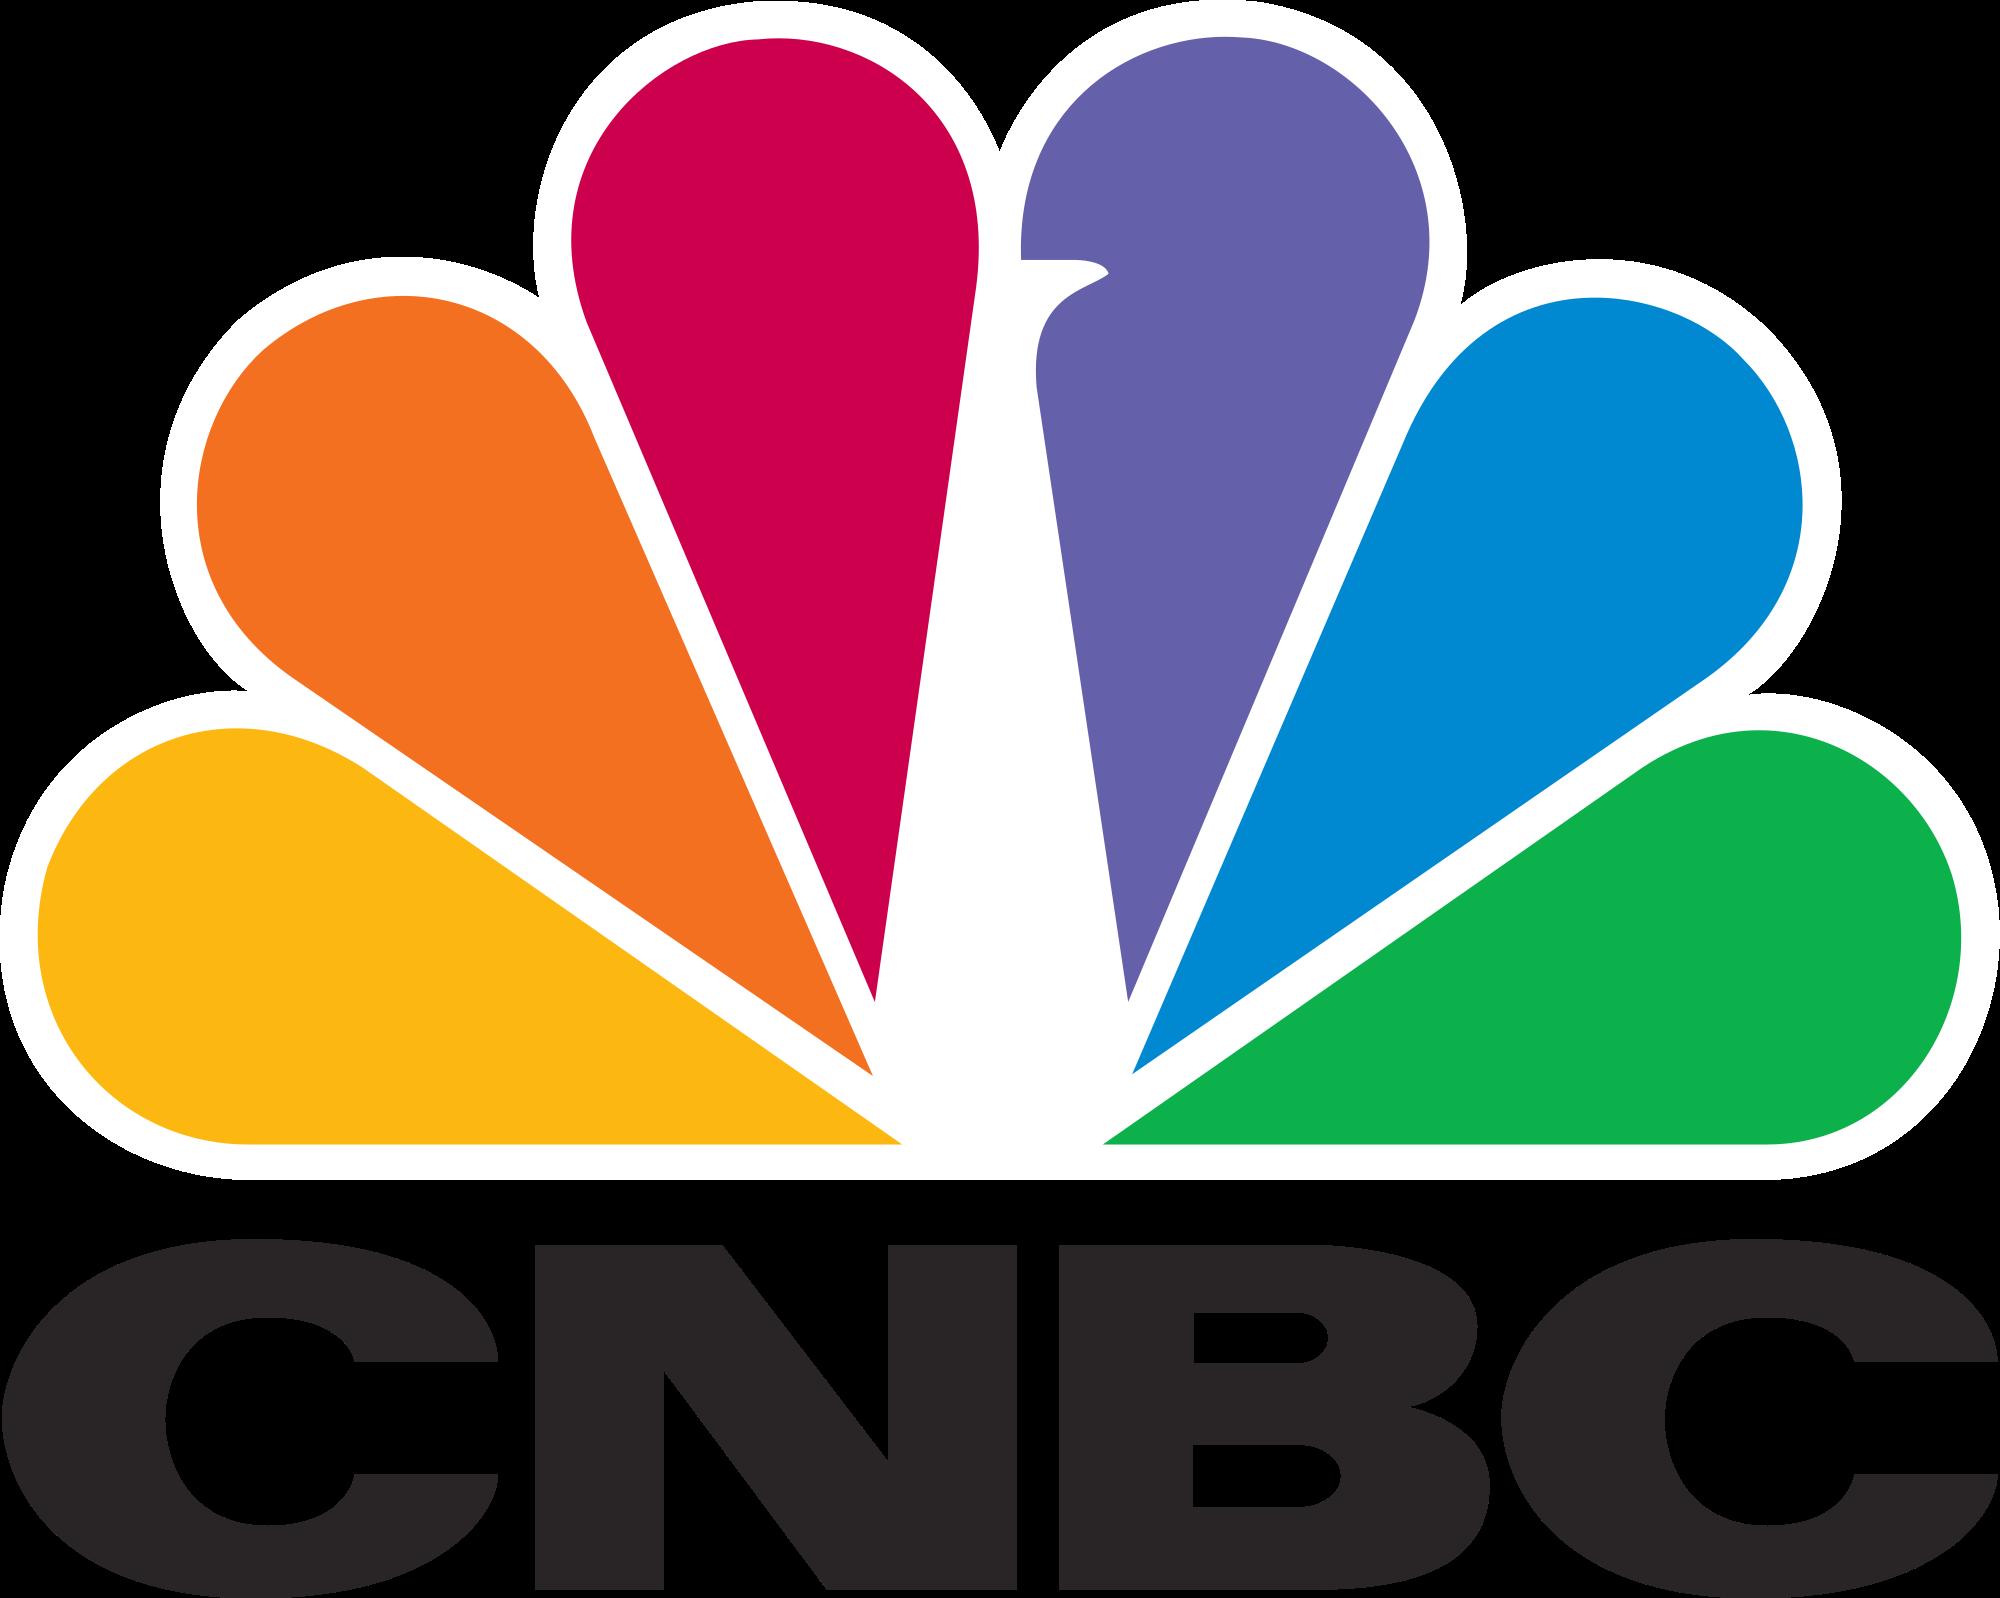 2000px-CNBC_logo.png